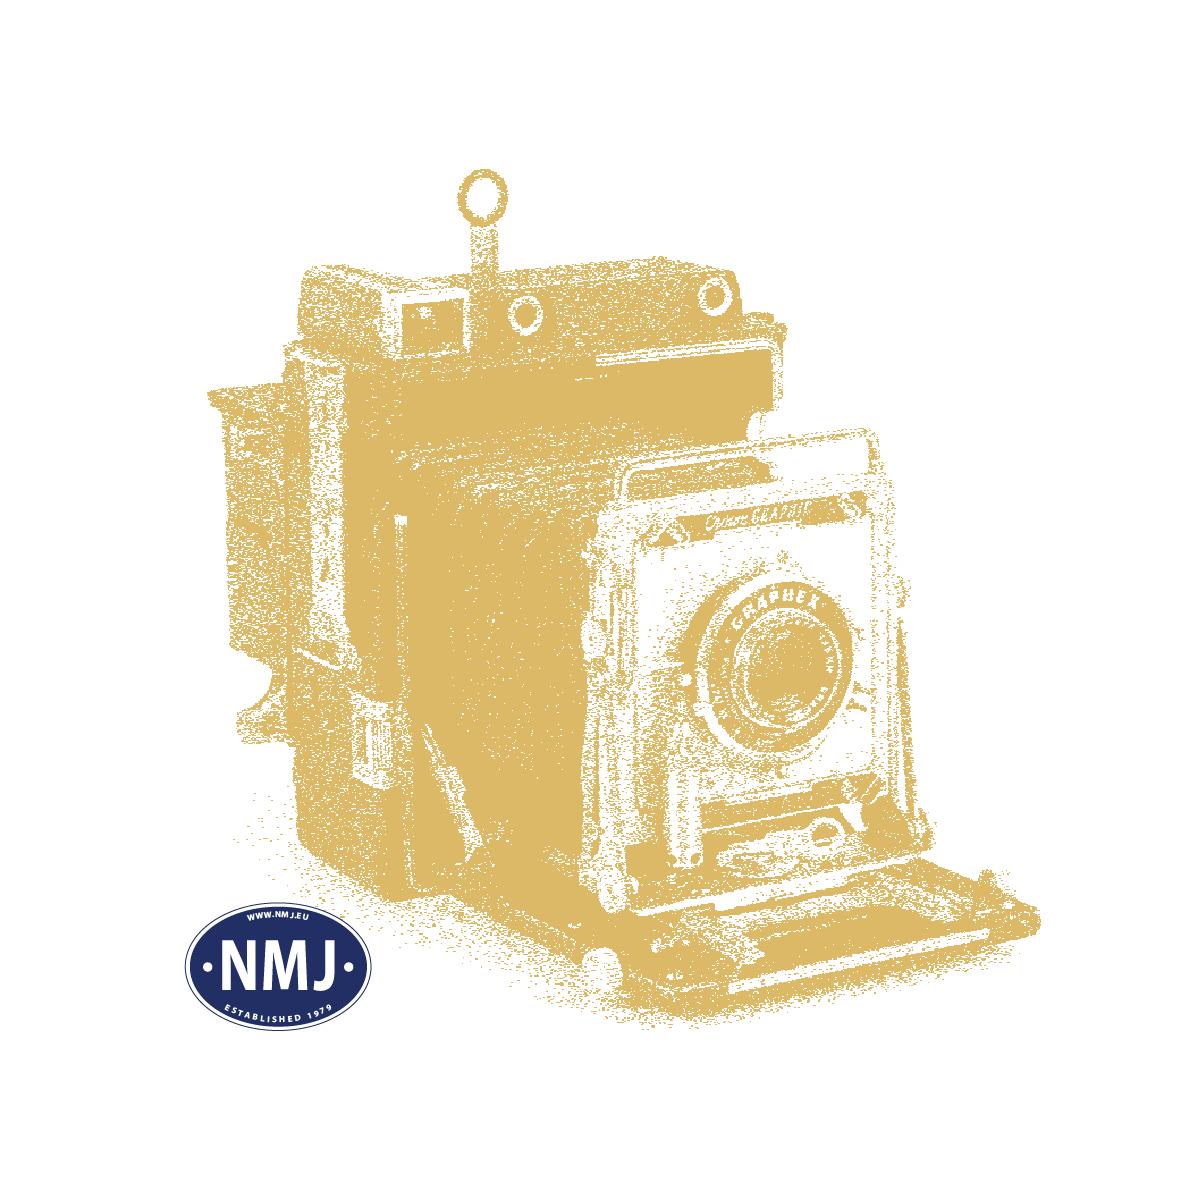 NMJT90201 - NMJ Topline MAV Diesellok M61.004, DC